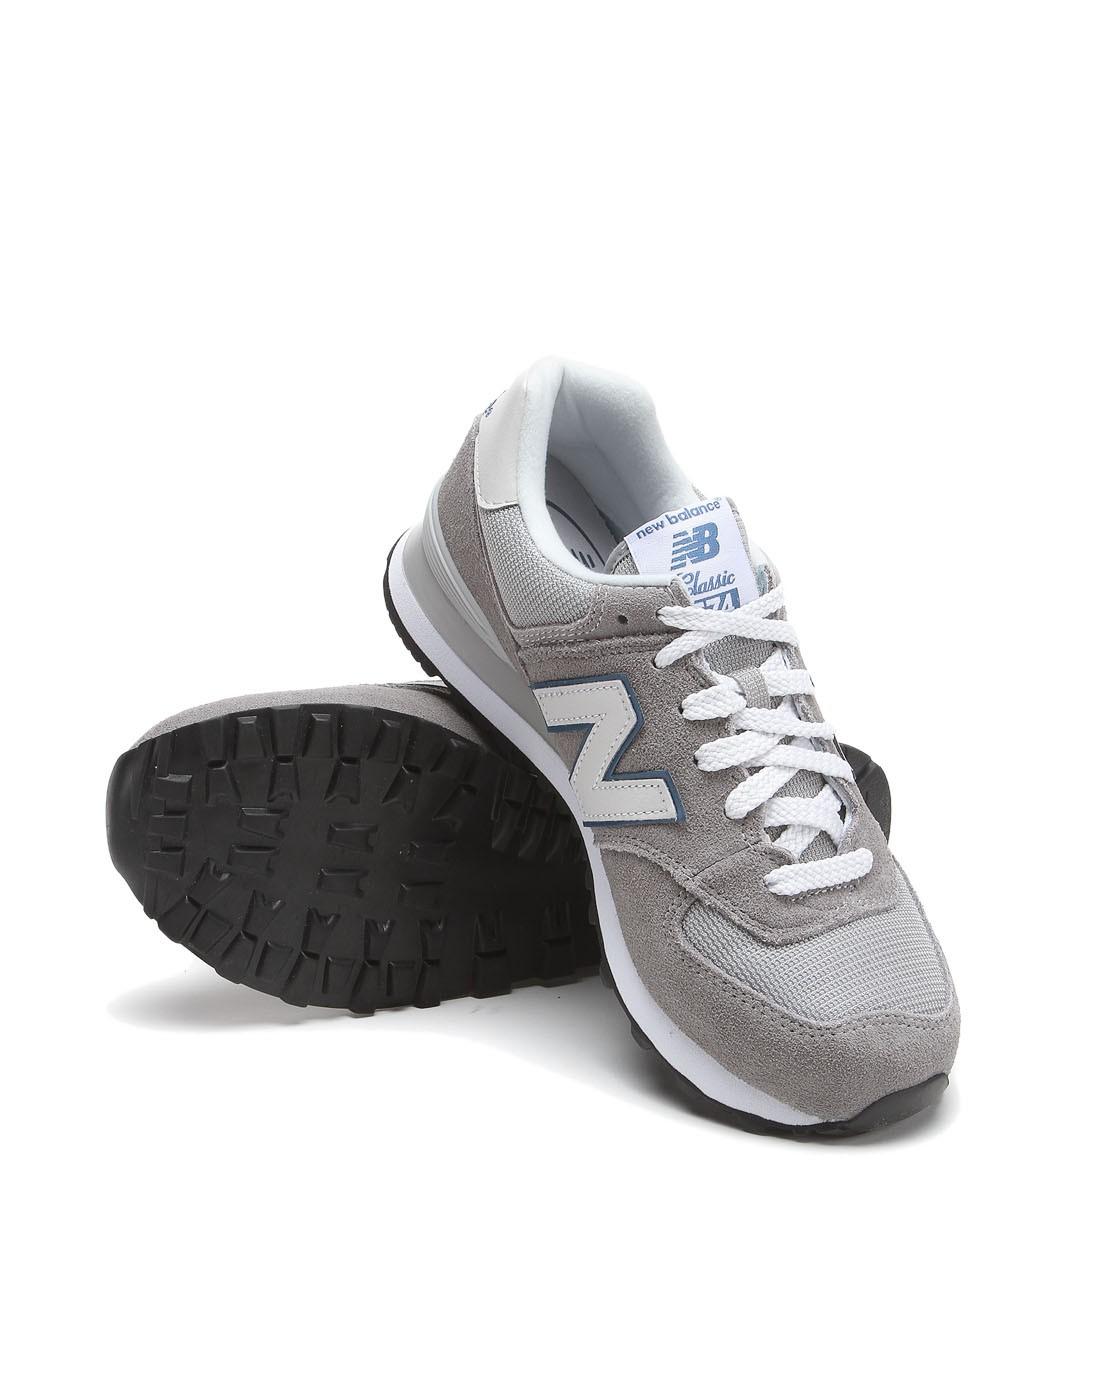 newbalance男鞋潮款式品牌 价格 女装评价网图片